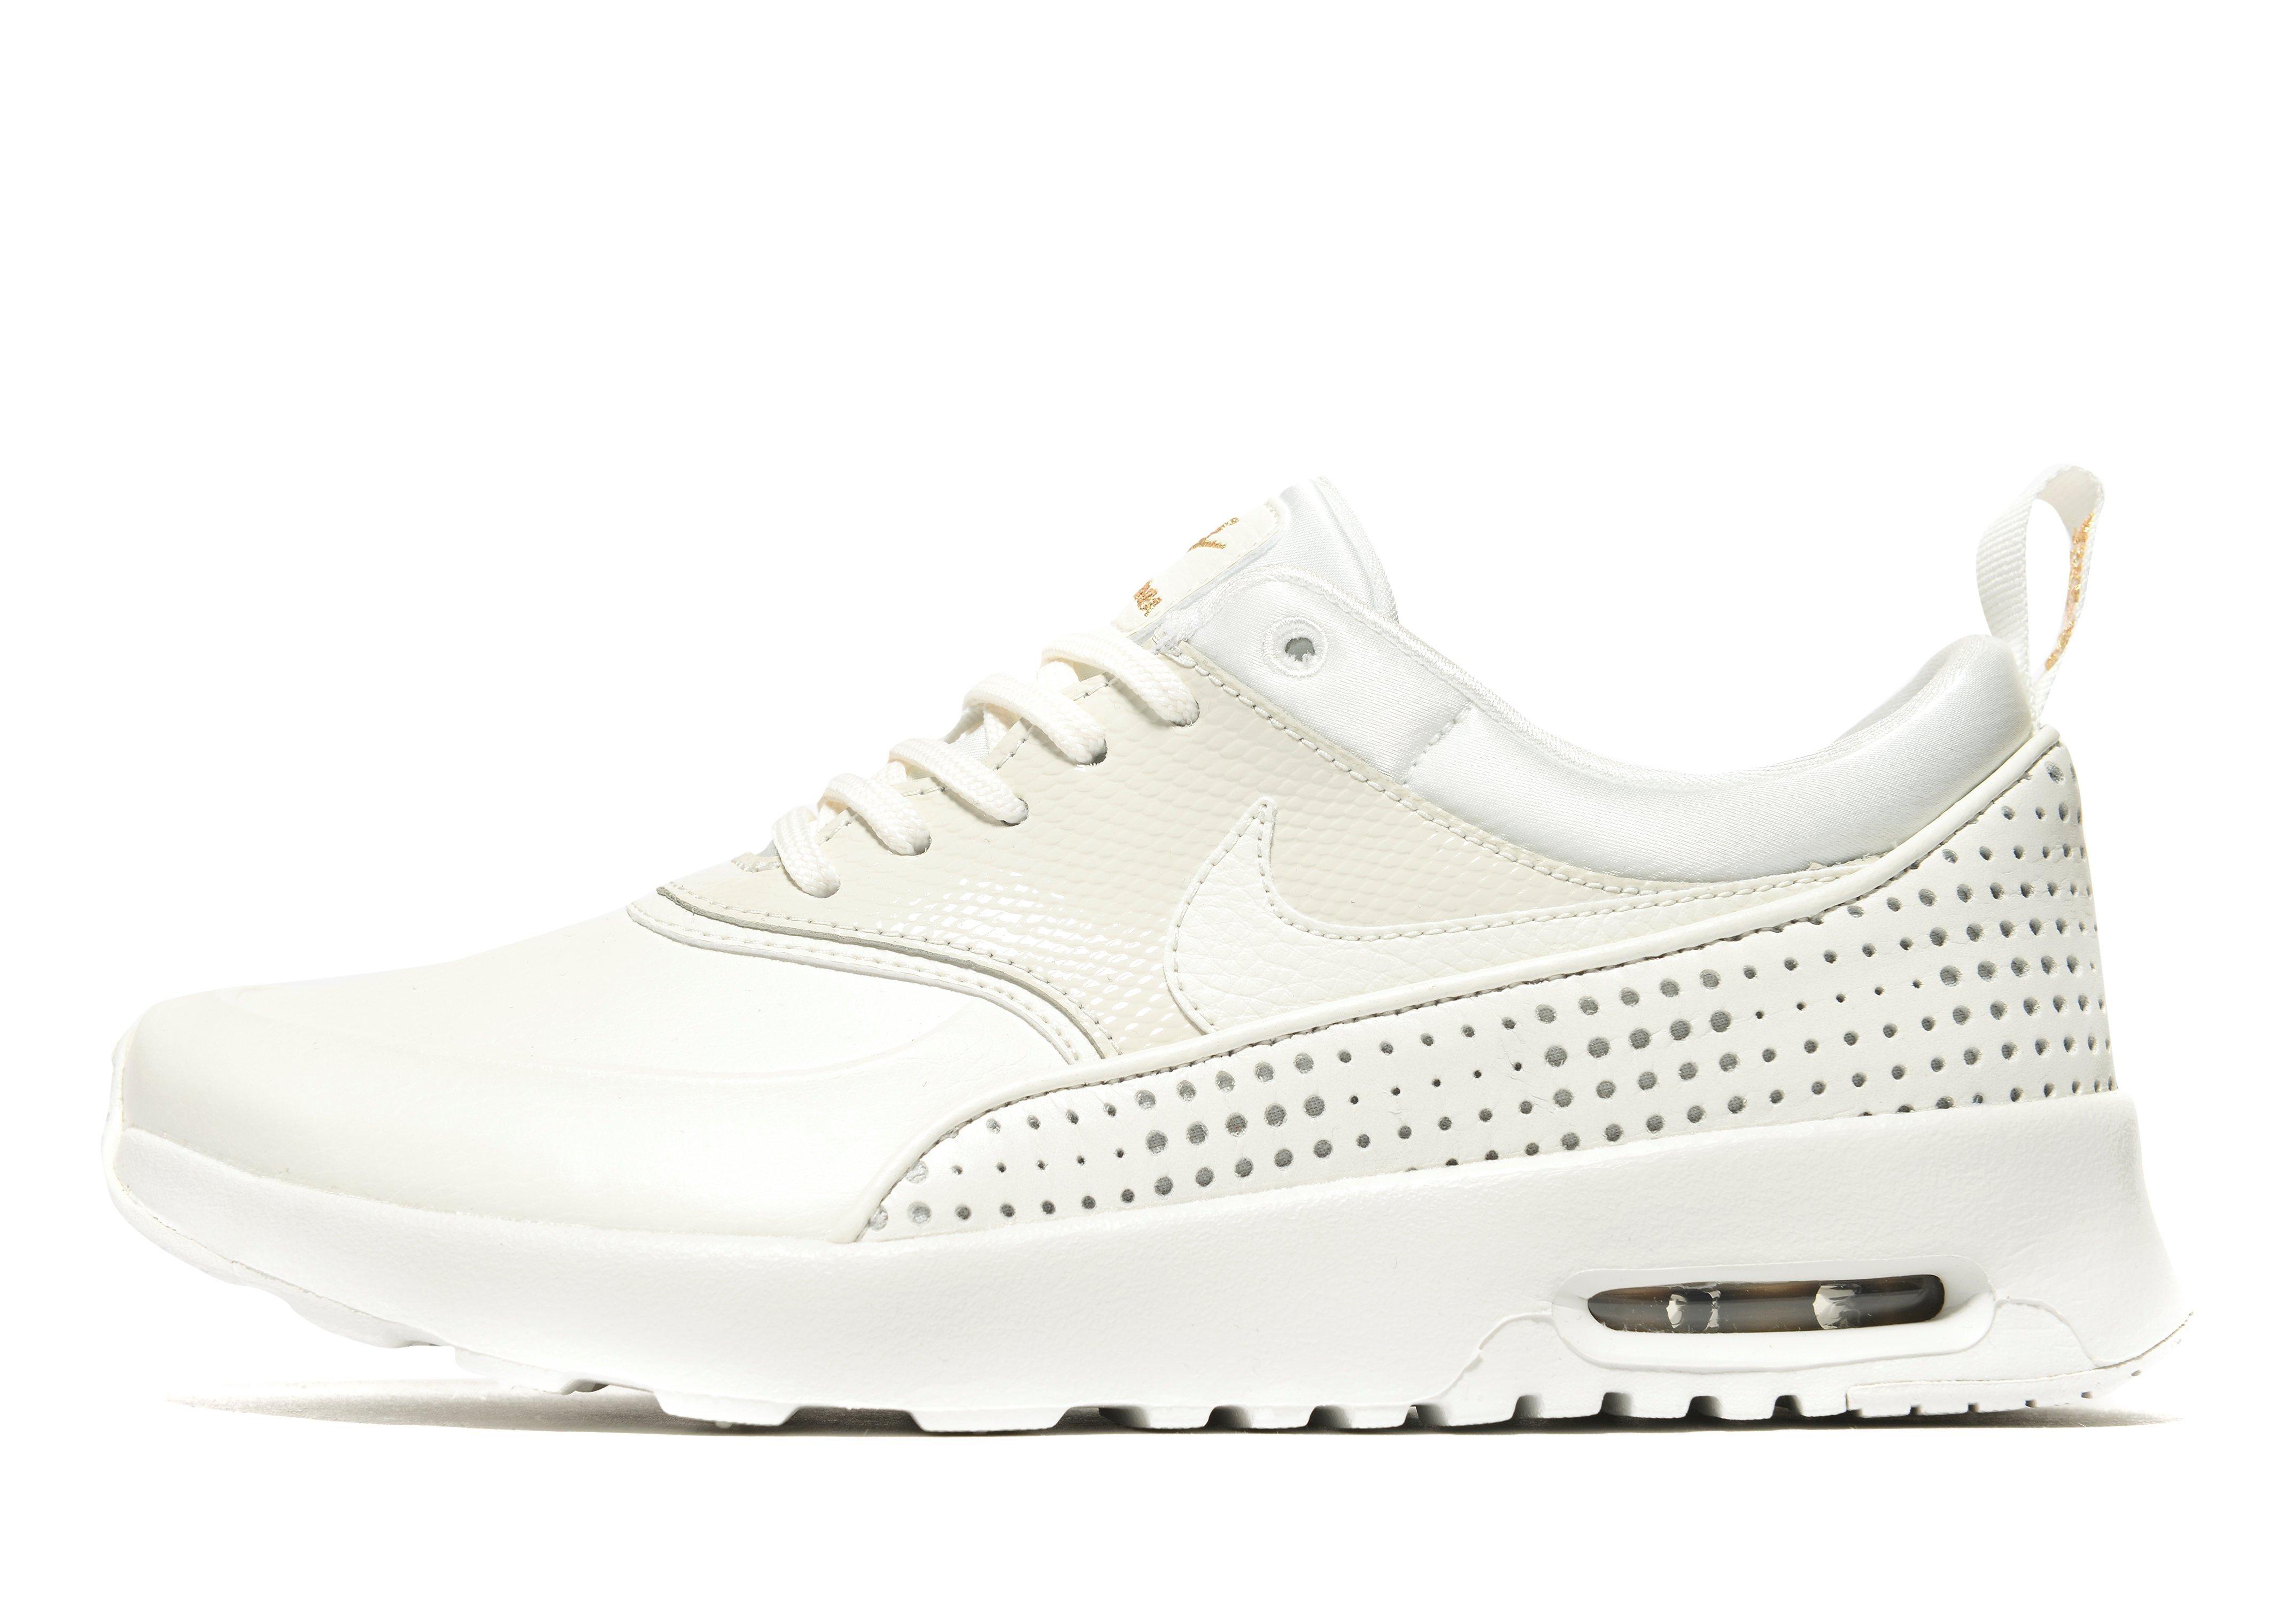 NEW! Nike Air Max Thea Premium Stealth Sneakers NWT